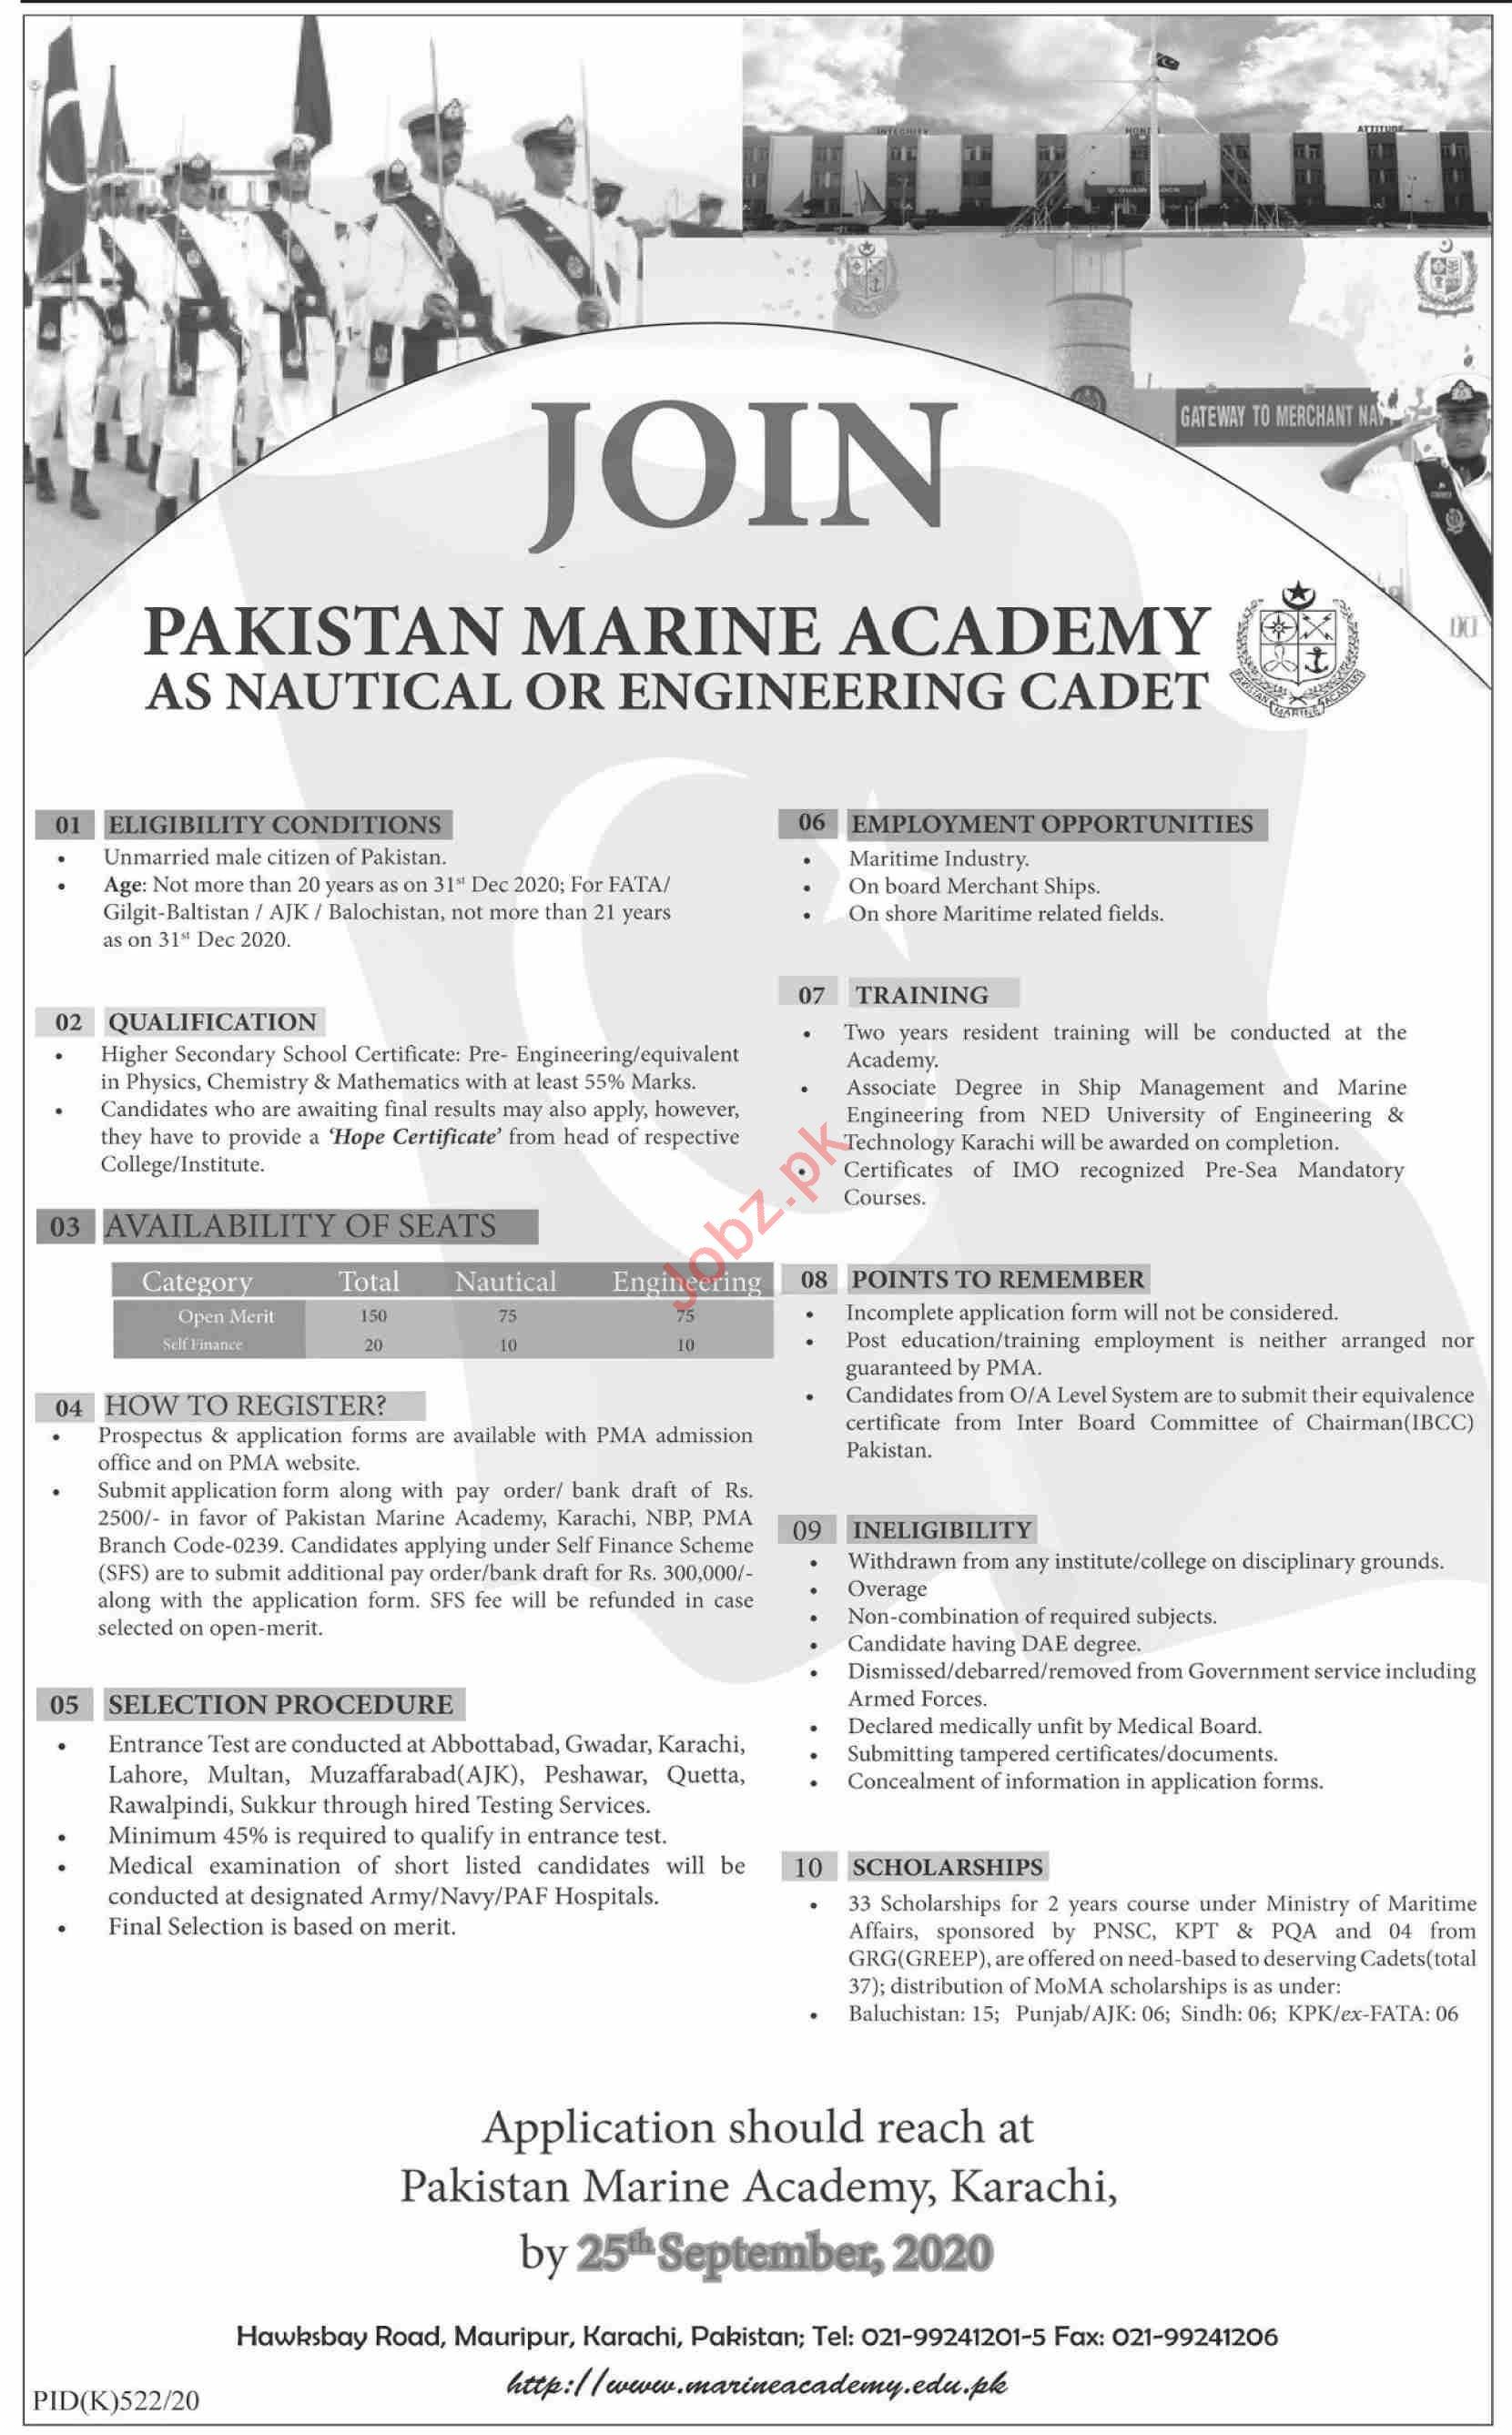 Join Pakistan Marine Academy As Engineer Cadet